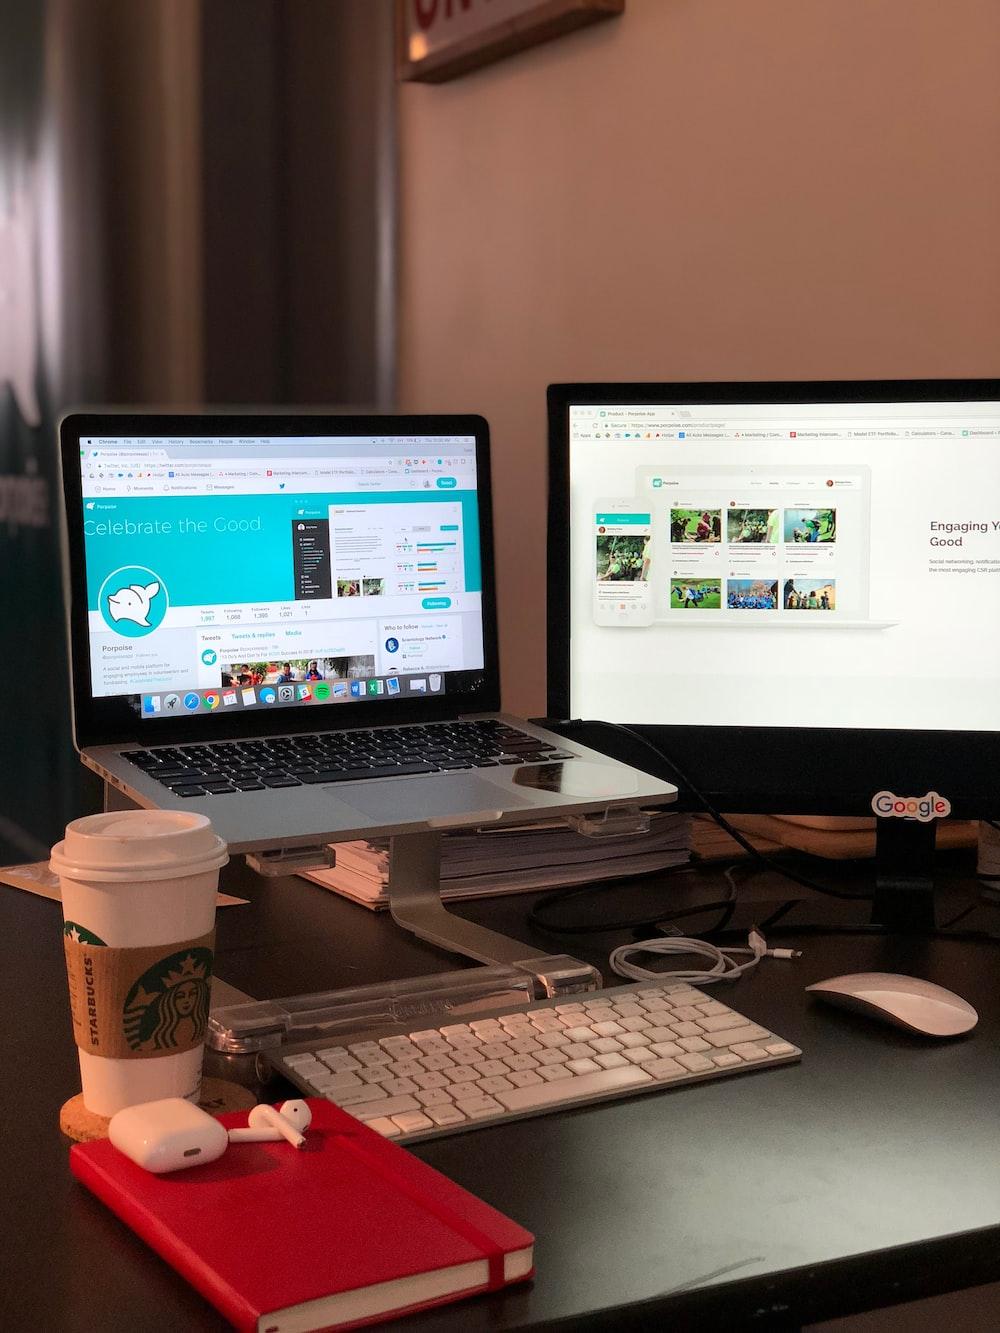 turned on MacBook Pro near Starbucks cup